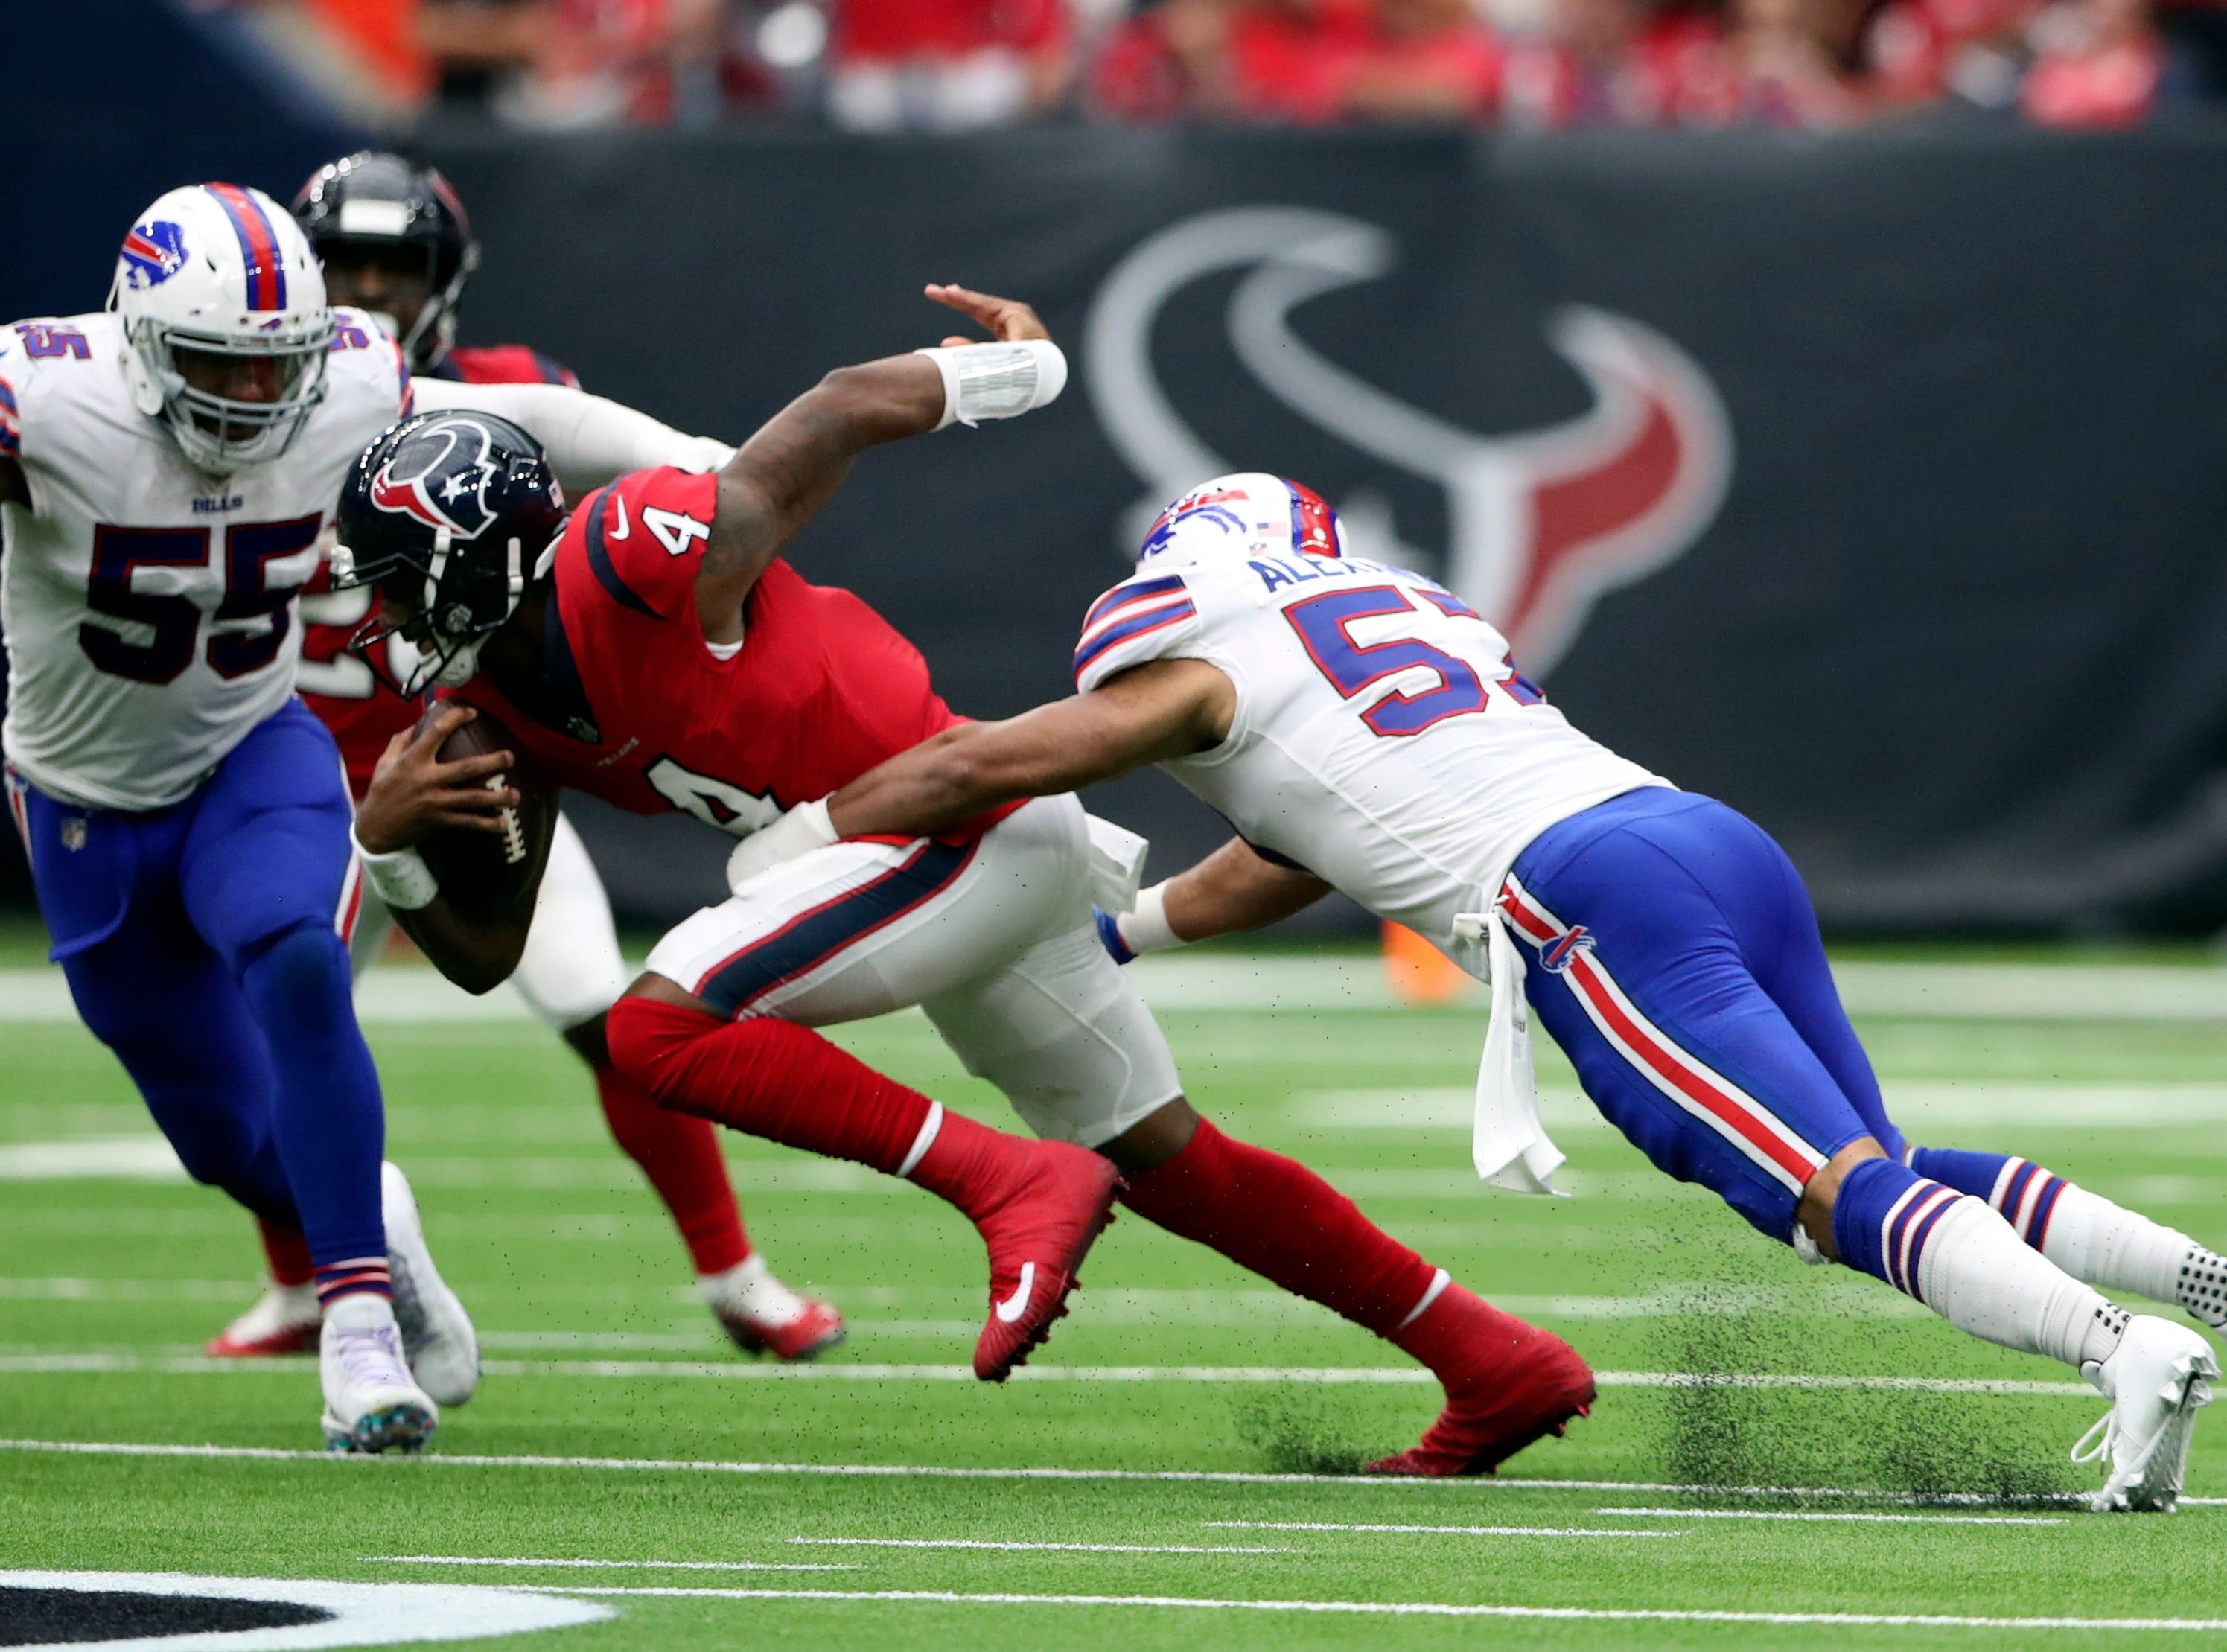 Oct 14, 2018; Houston, TX, USA; Houston Texans quarterback Deshaun Watson (4) is sacked by Buffalo Bills linebacker Lorenzo Alexander (57) during the second half at NRG Stadium. Mandatory Credit: Kevin Jairaj-USA TODAY Sports